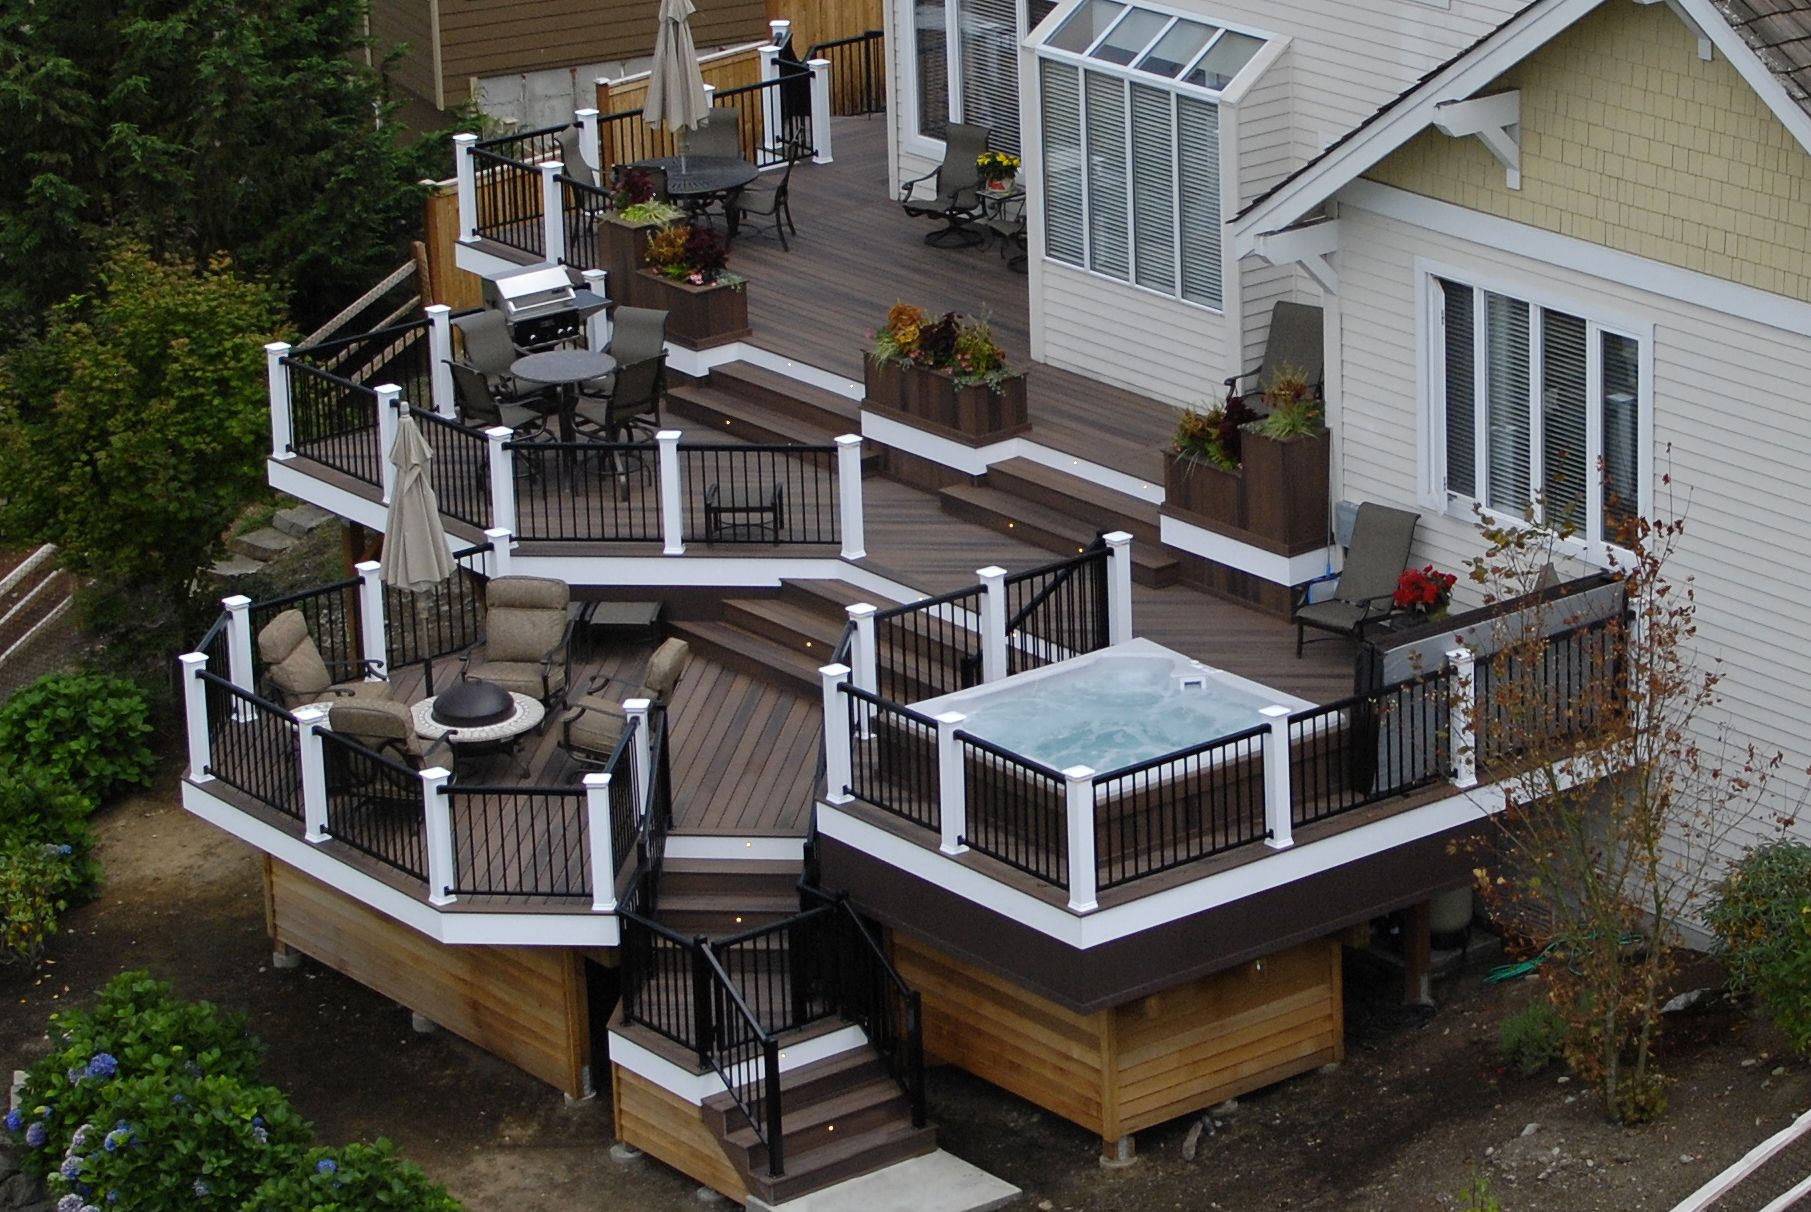 Decks Google Search Patio Deck Designs Deck Designs Backyard Deck Design